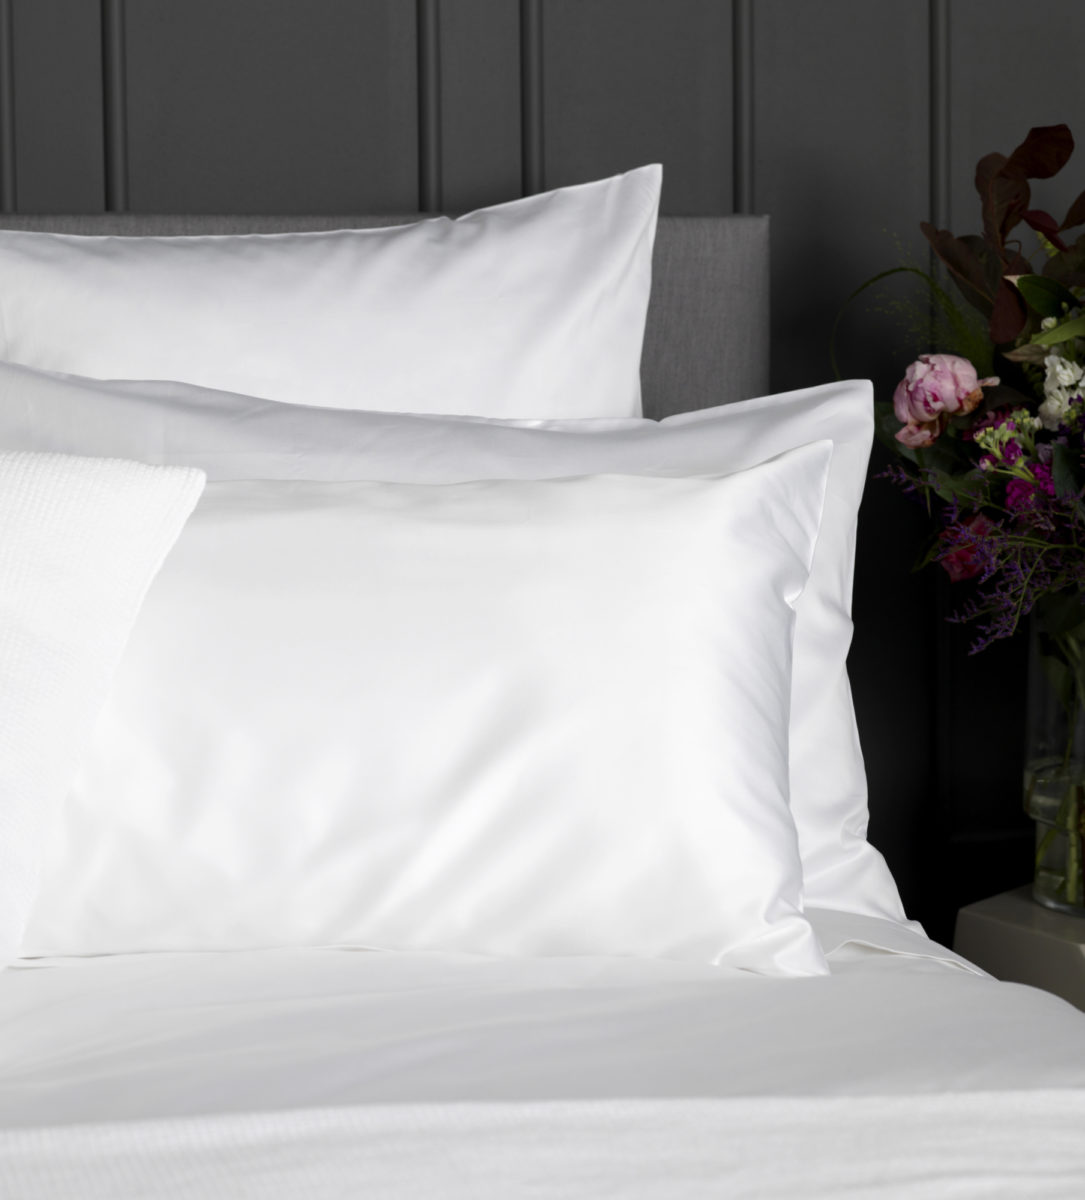 Luxury White 600 Thread Count Bed Linen Secret Linen Store